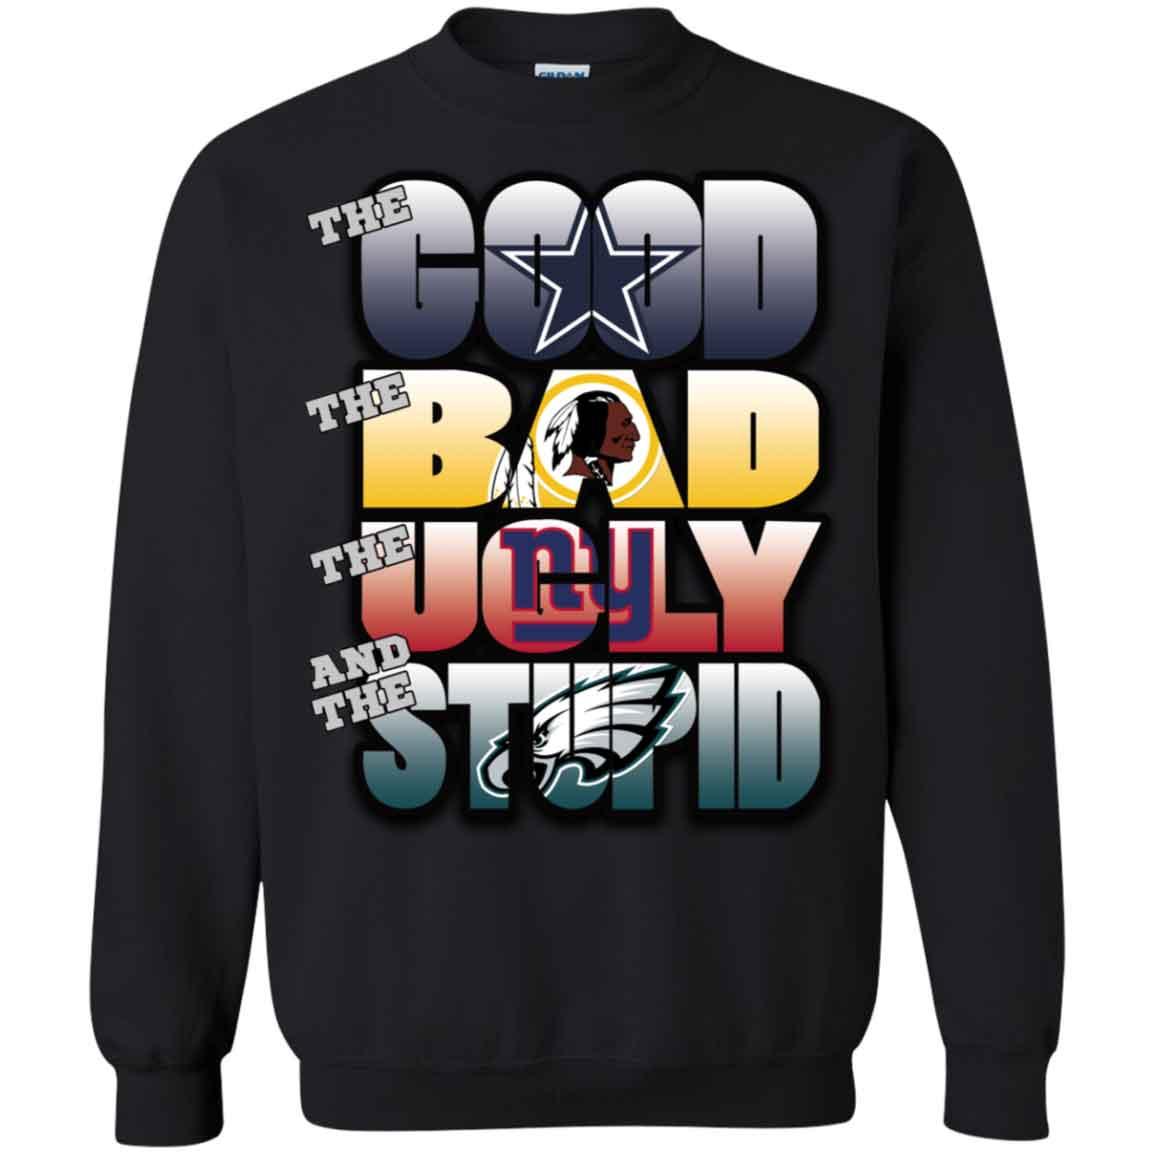 Washington Redskins Philadelphia Eagles Good Bad Ugly Stupid Christmas Ugly Sweater Hoodies Sweatshirts